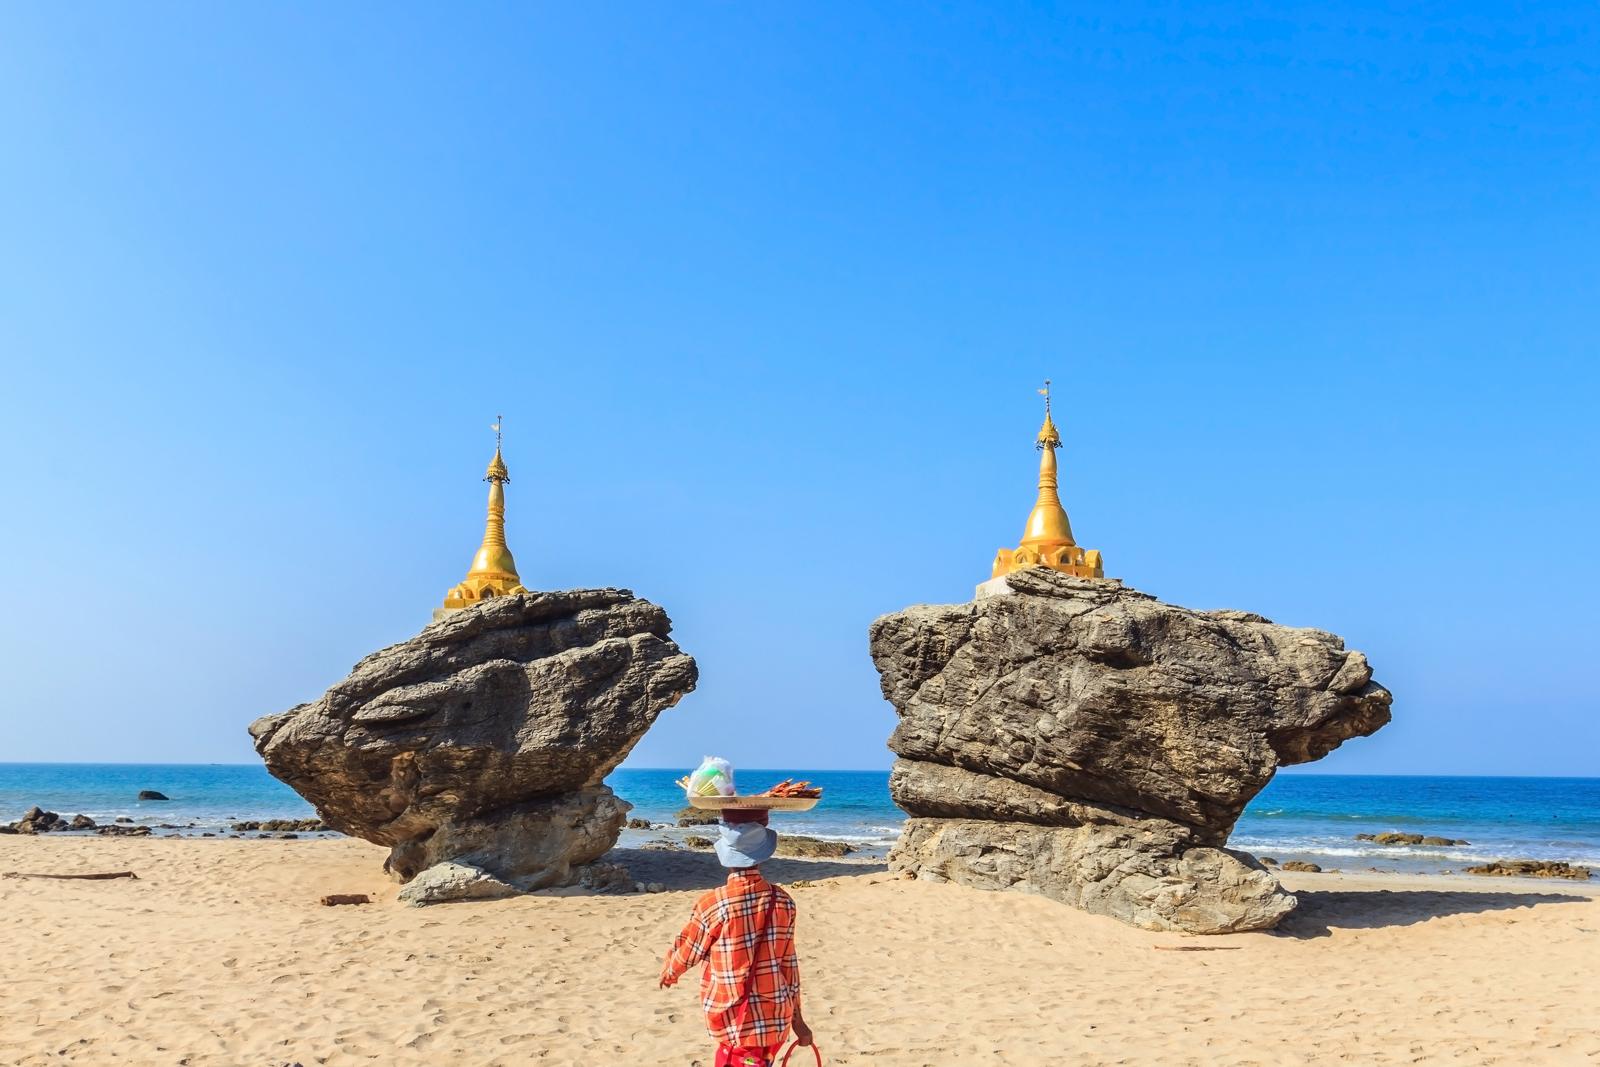 ngwe-saung-beach-myanmar-car-rental-10.jpg